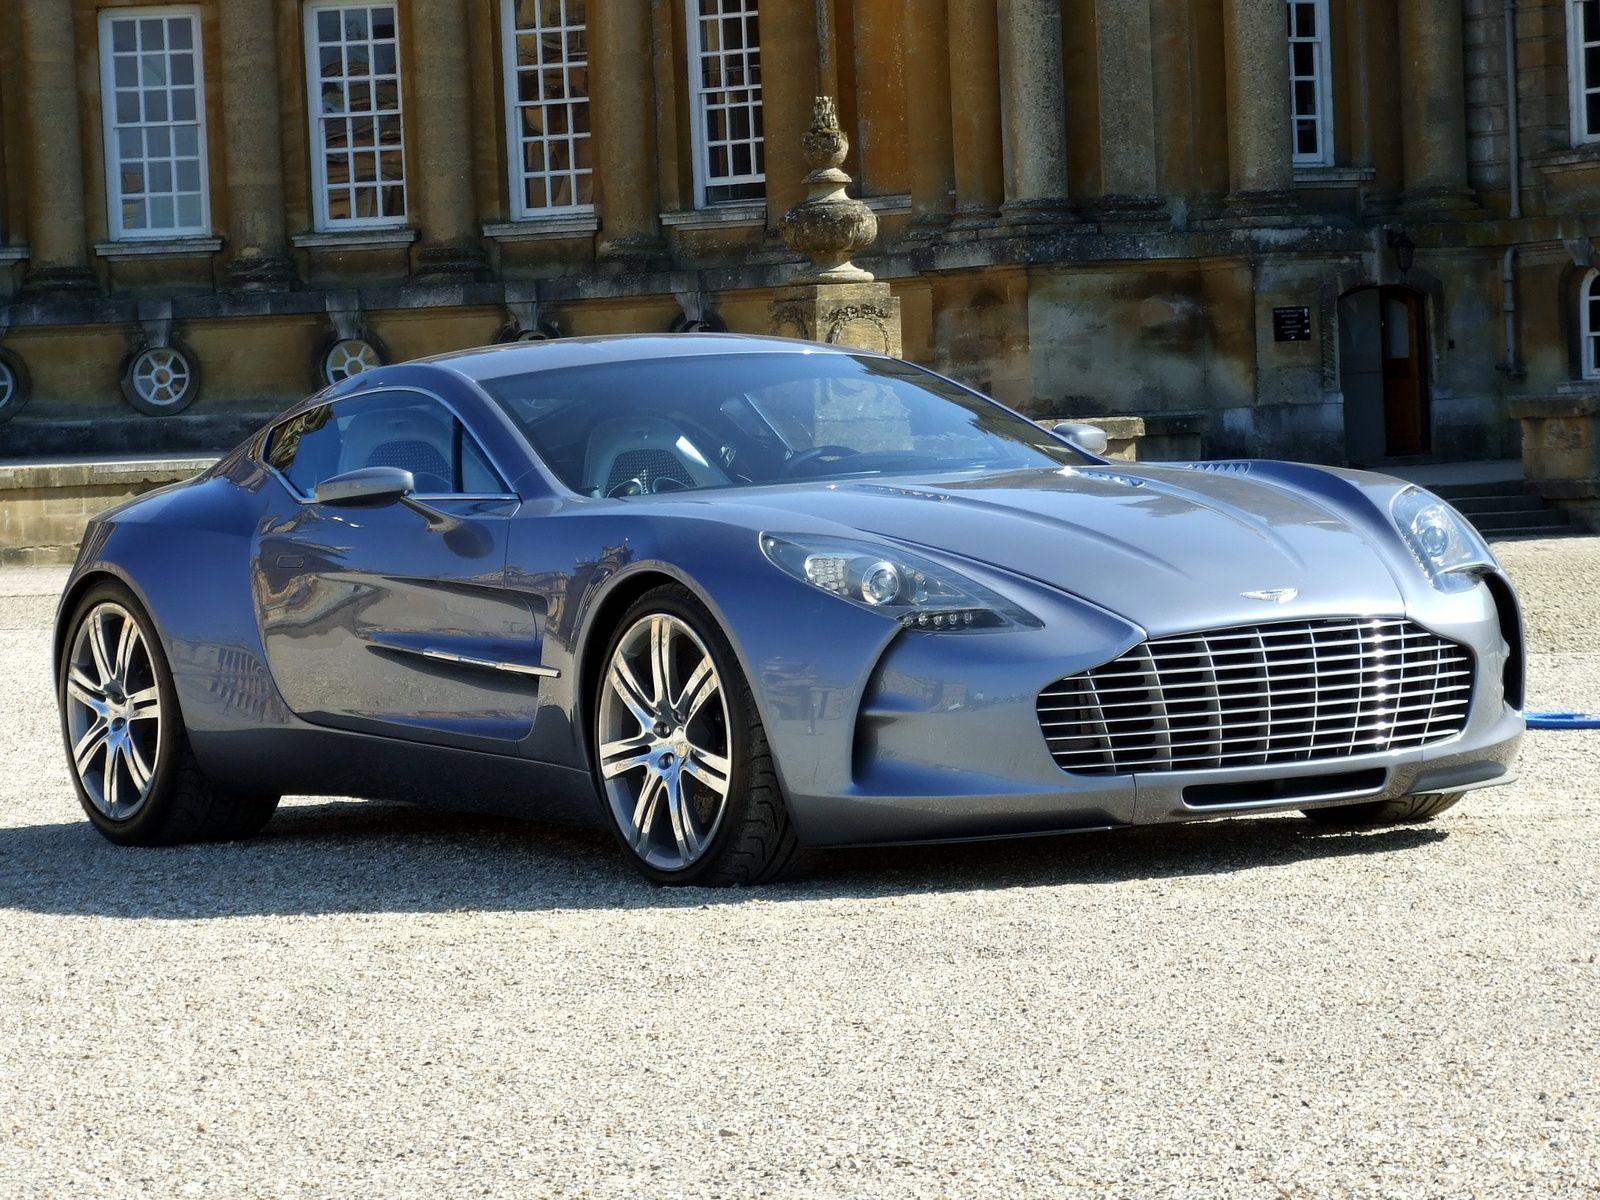 aston martin one 77 wallpaper 1080p #xtk | cars | pinterest